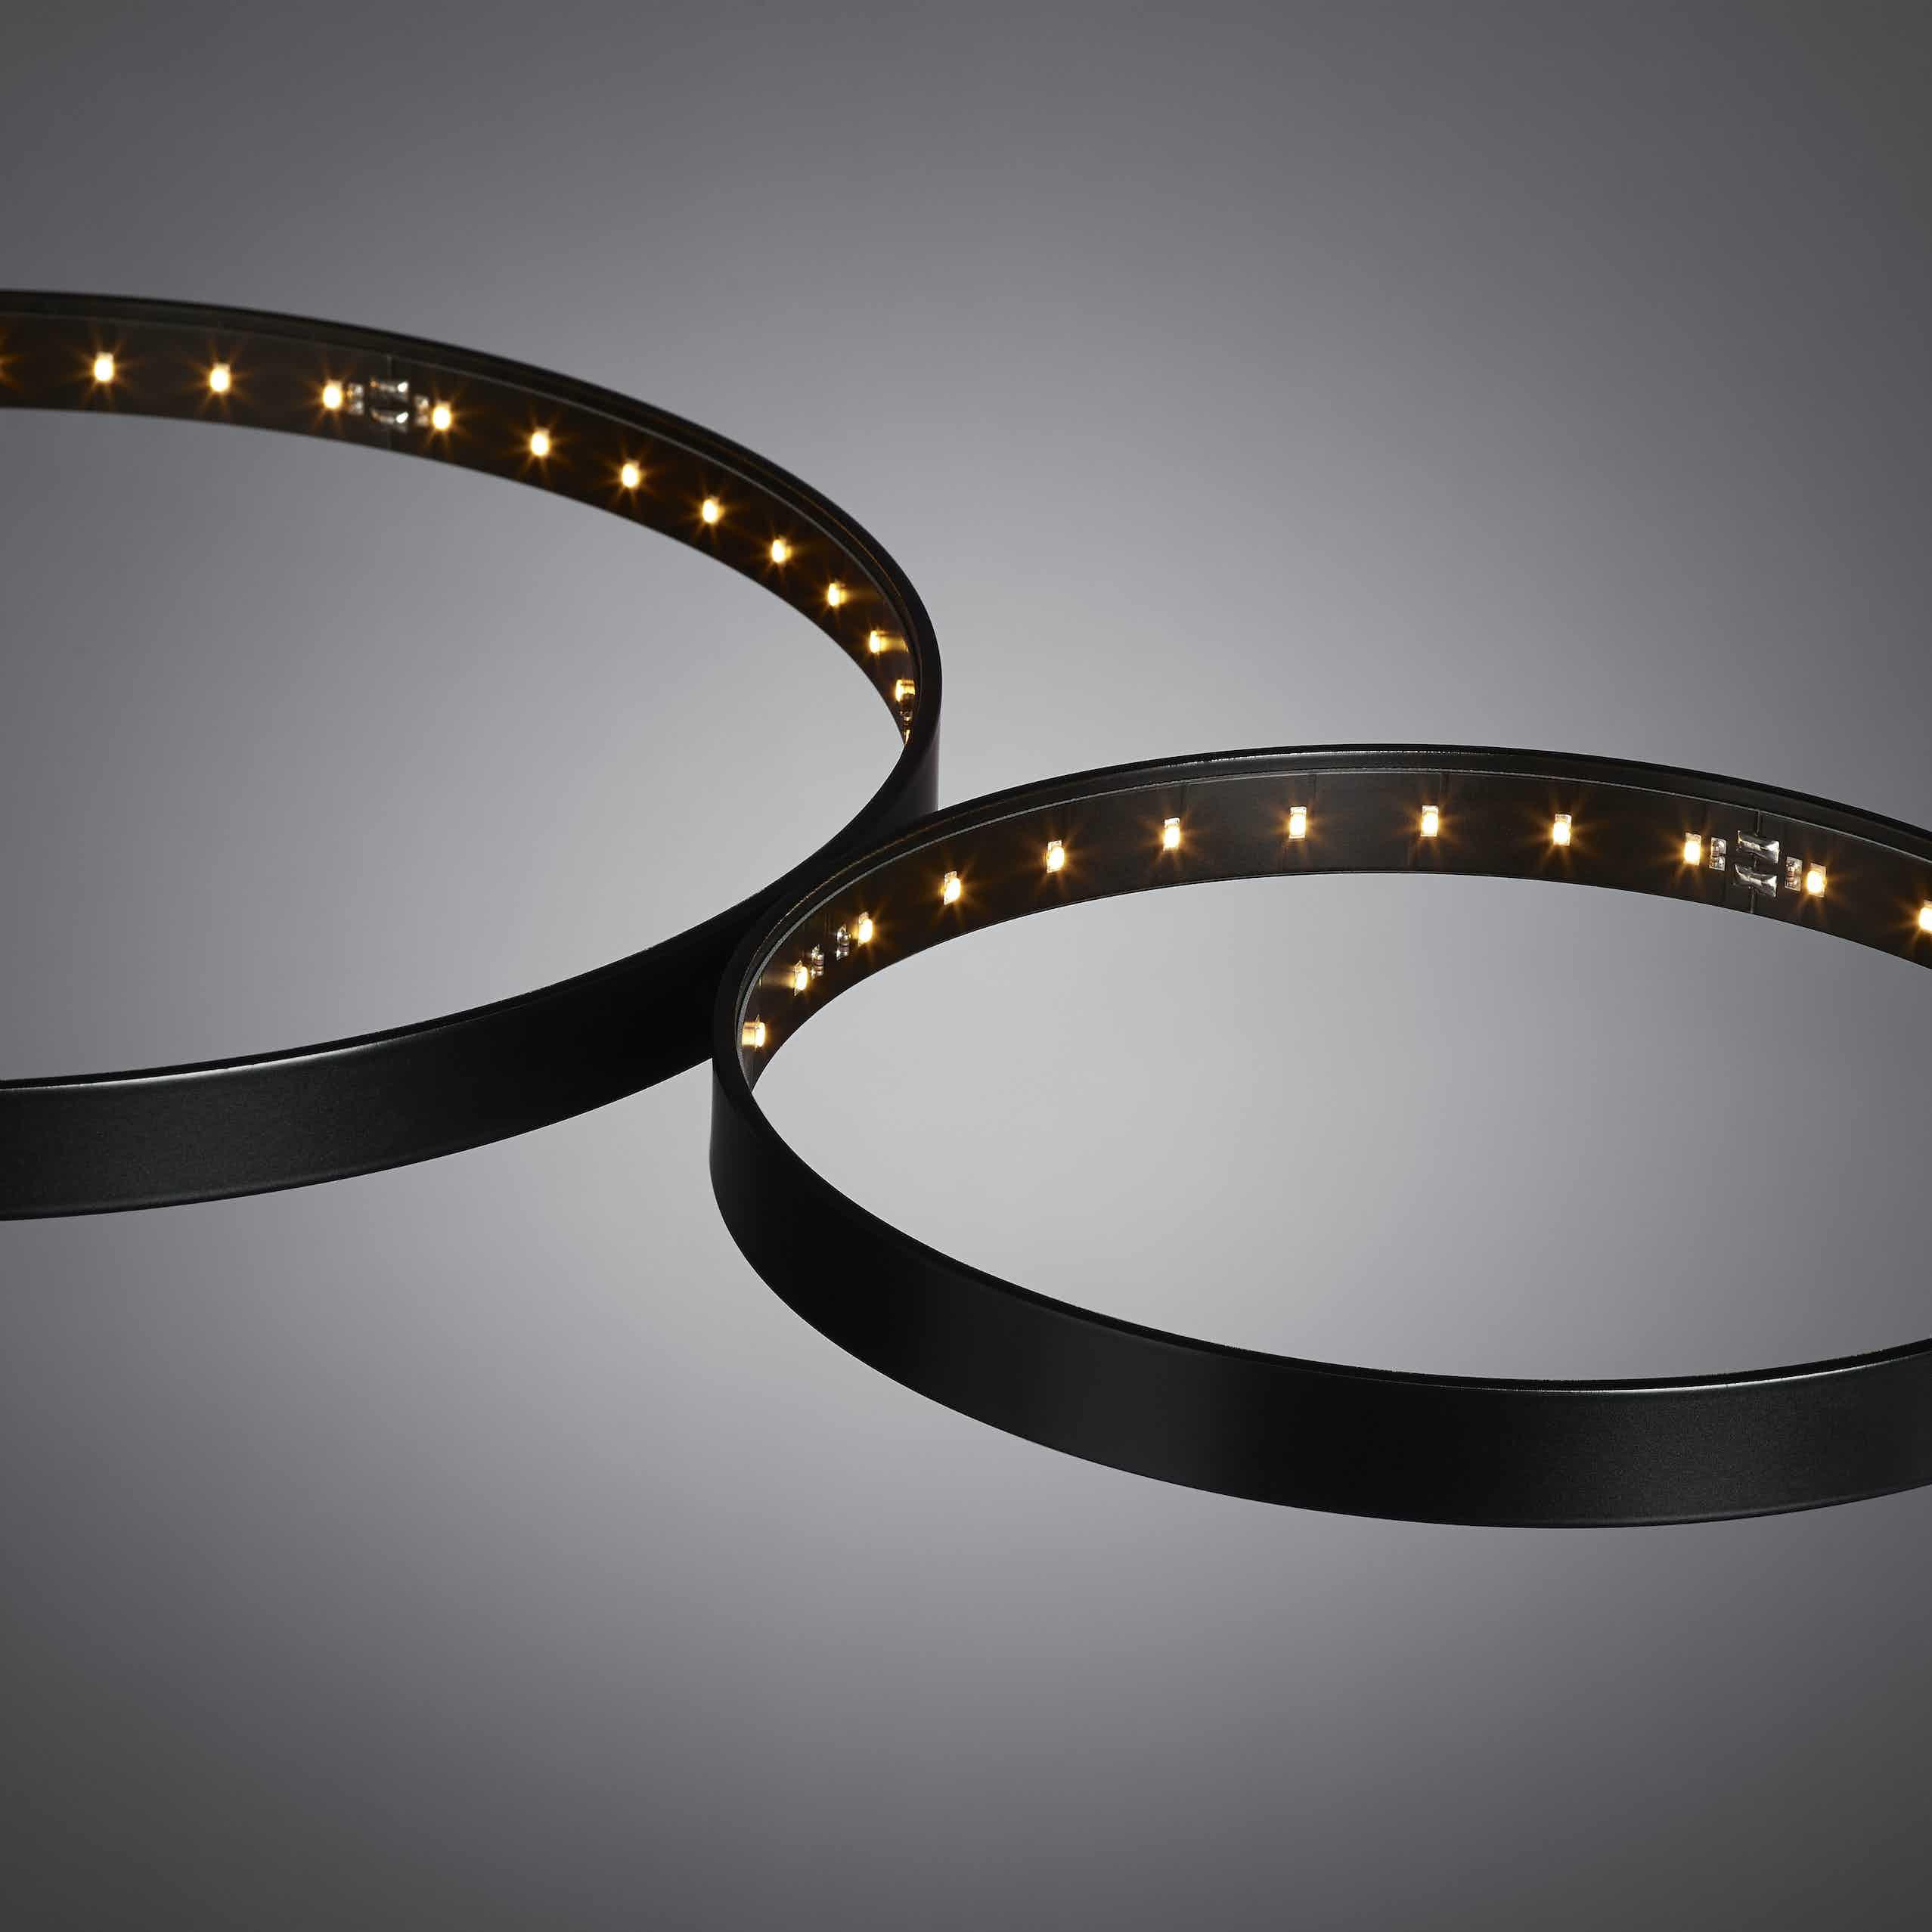 Le-deun-luminaires-super-8-hanging-lamp-black-detail-haute-living